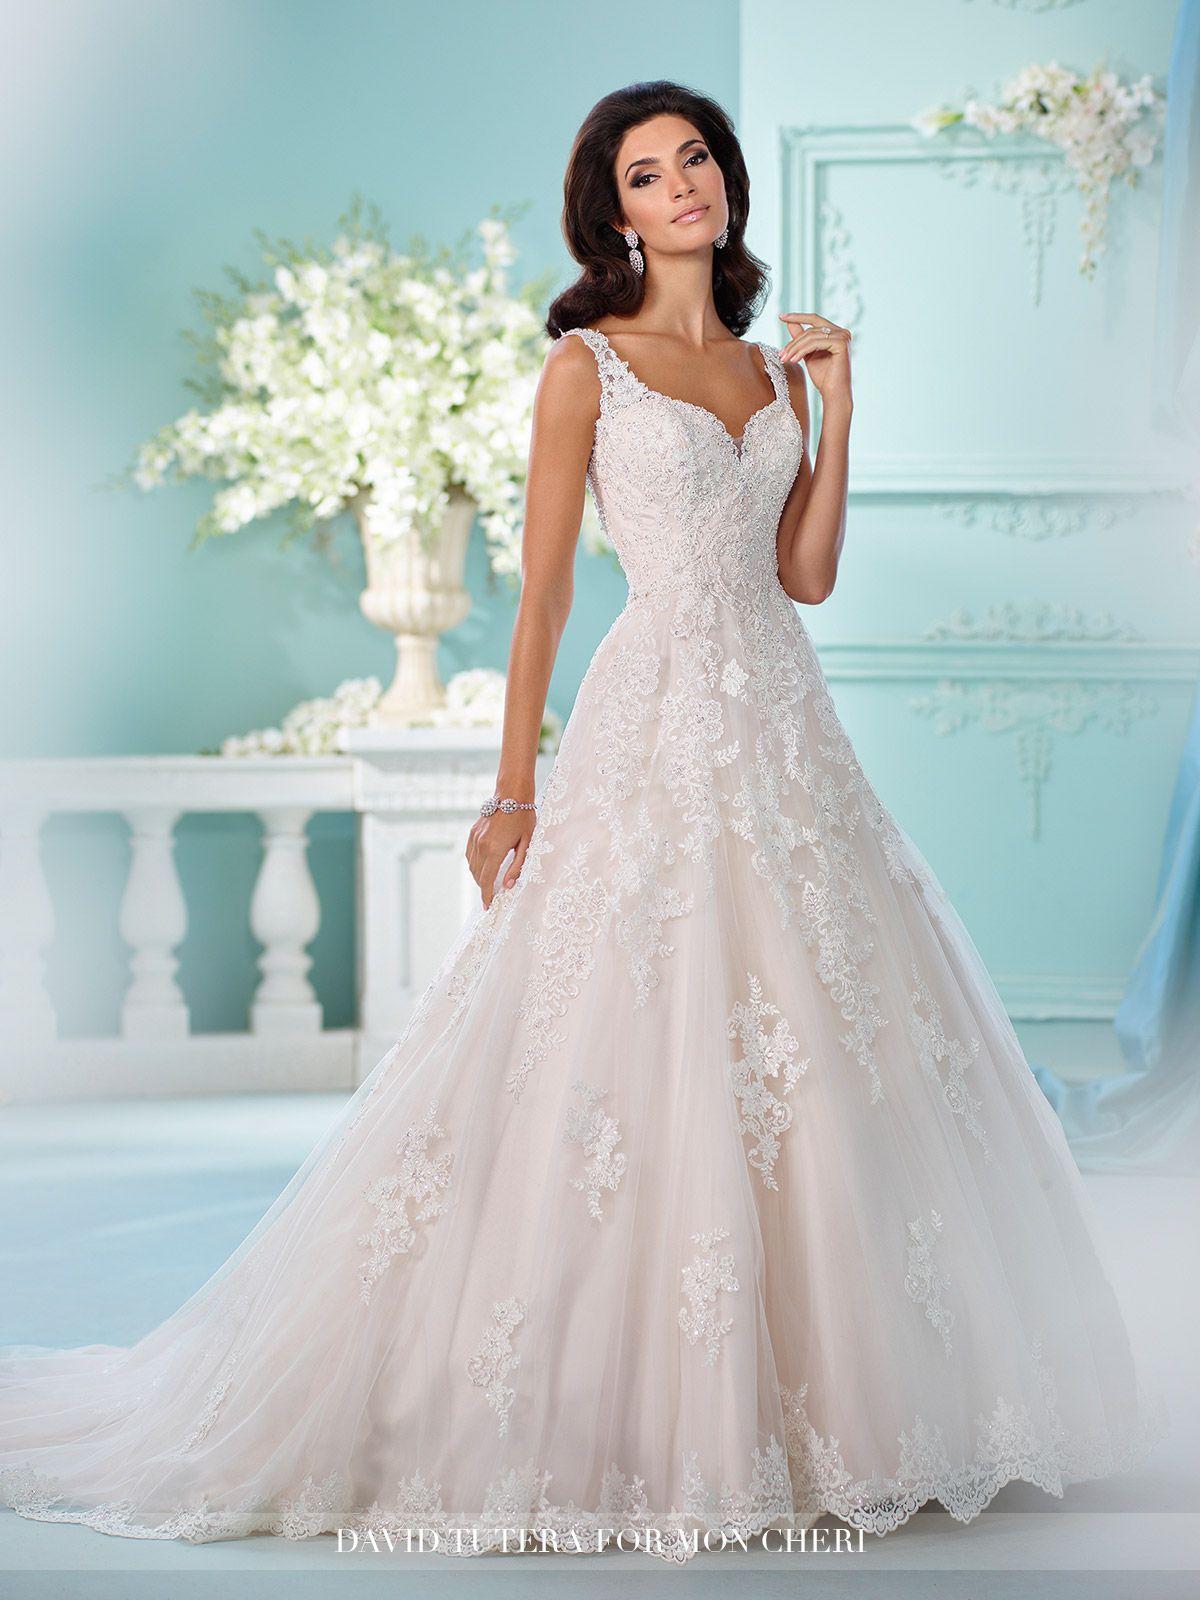 Dropped Waist A-line Beaded Lace Wedding Dress- 216248 Violet | Los ...